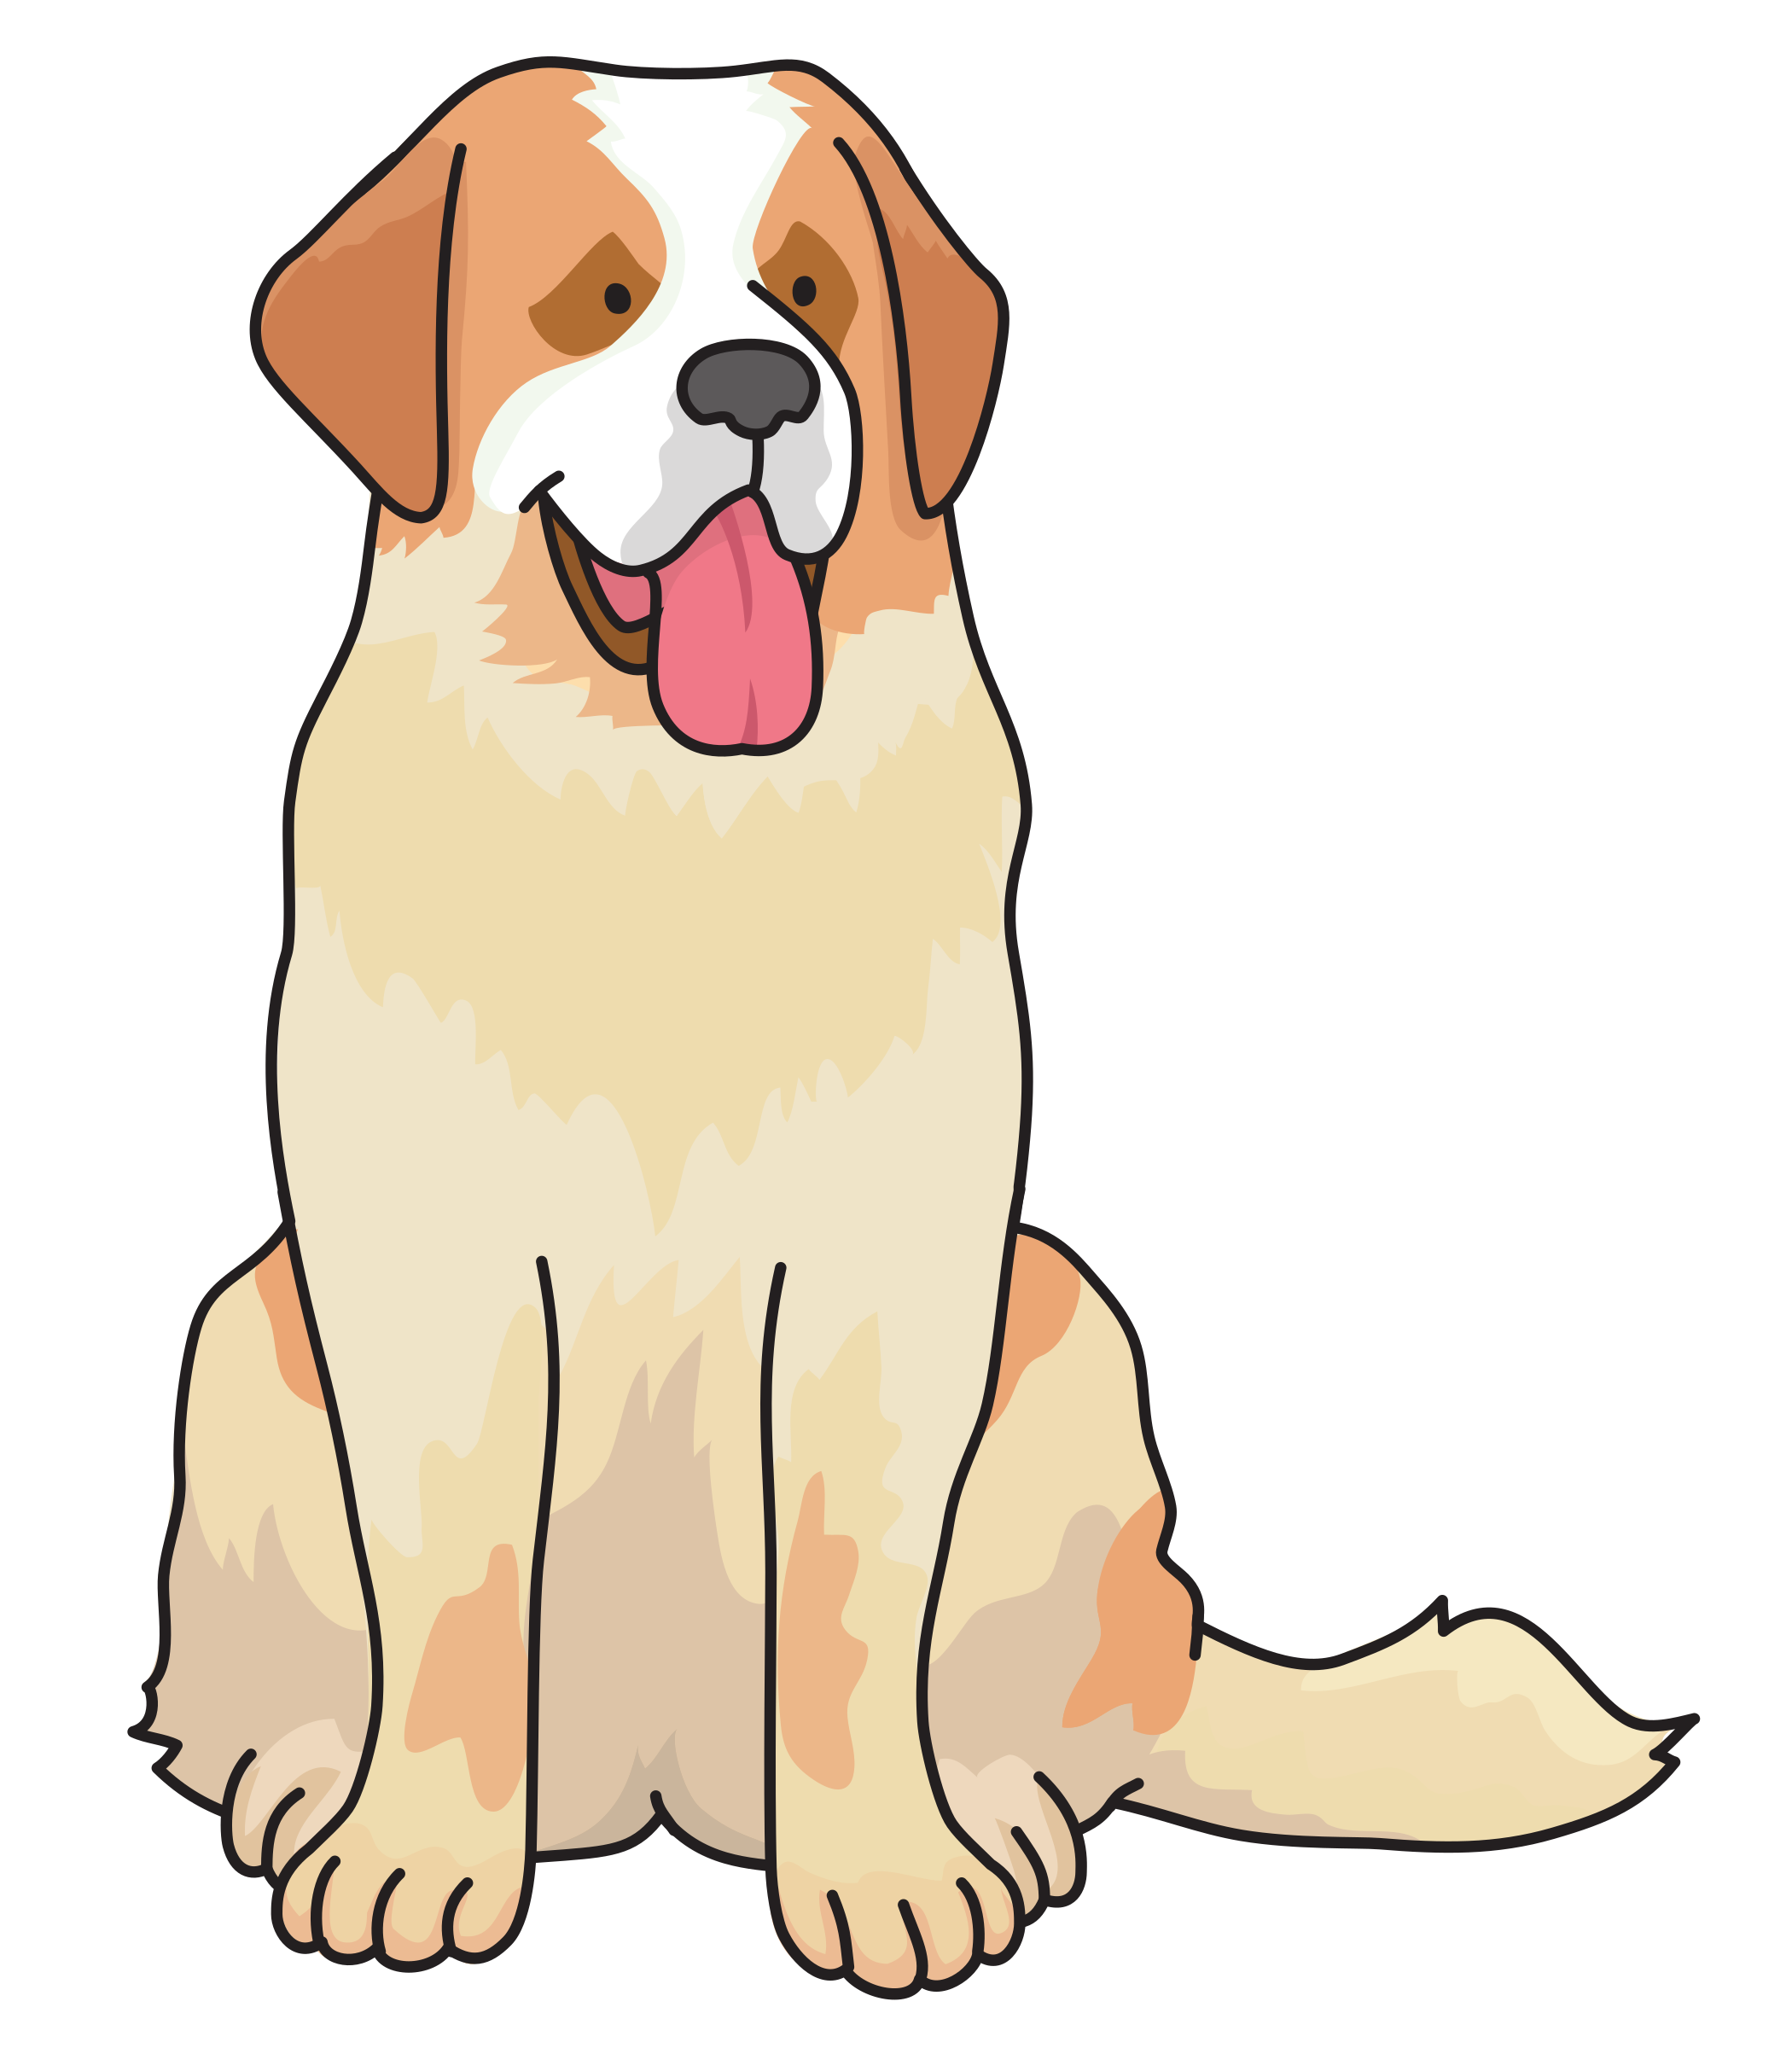 Saint bernard dog clipart png library download Clipart - dog - Saint Bernard png library download